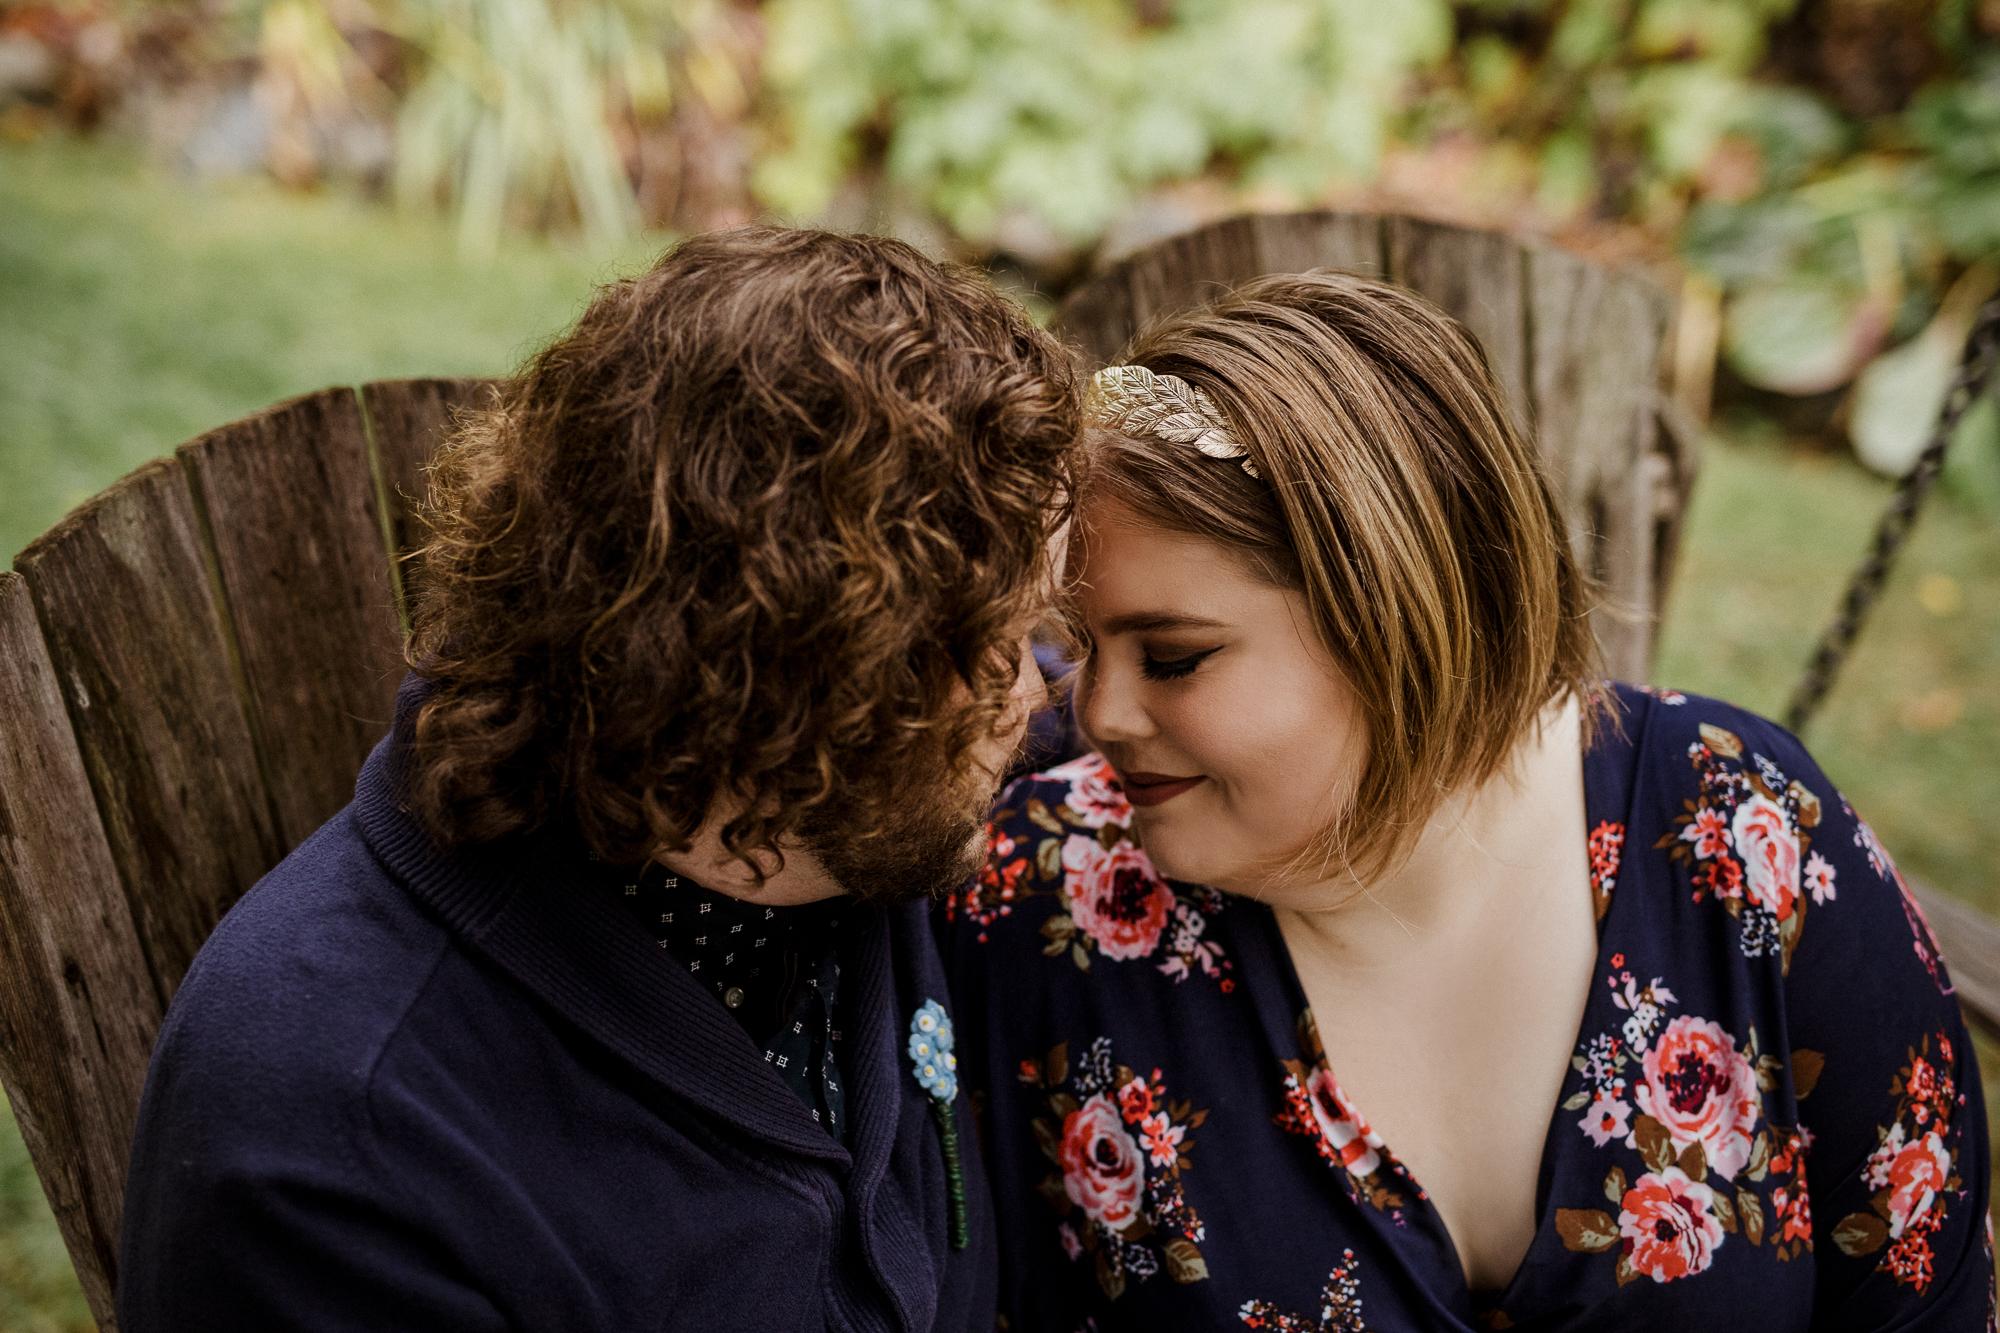 Victoria Bc Couples Boudoir Photography.jpg